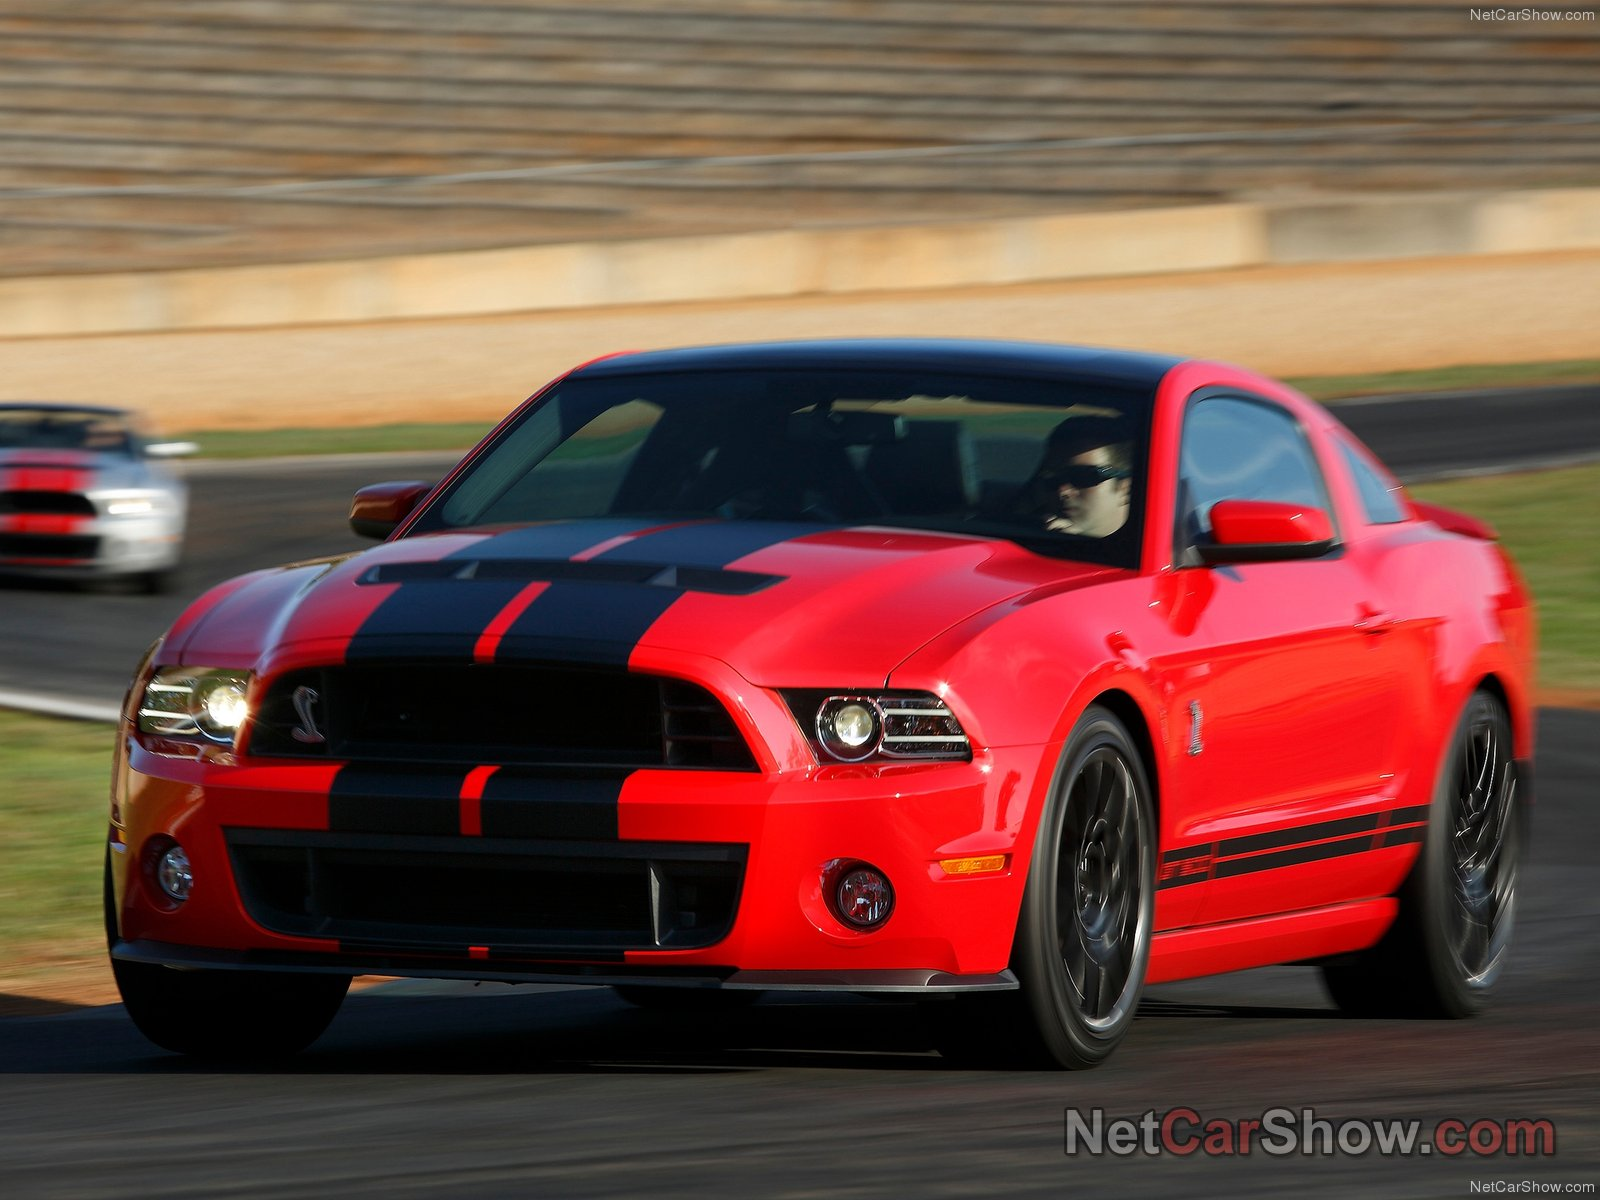 Ford Mustang (Форд Мустанг) - Продажа, Цены, Отзывы, Фото ...